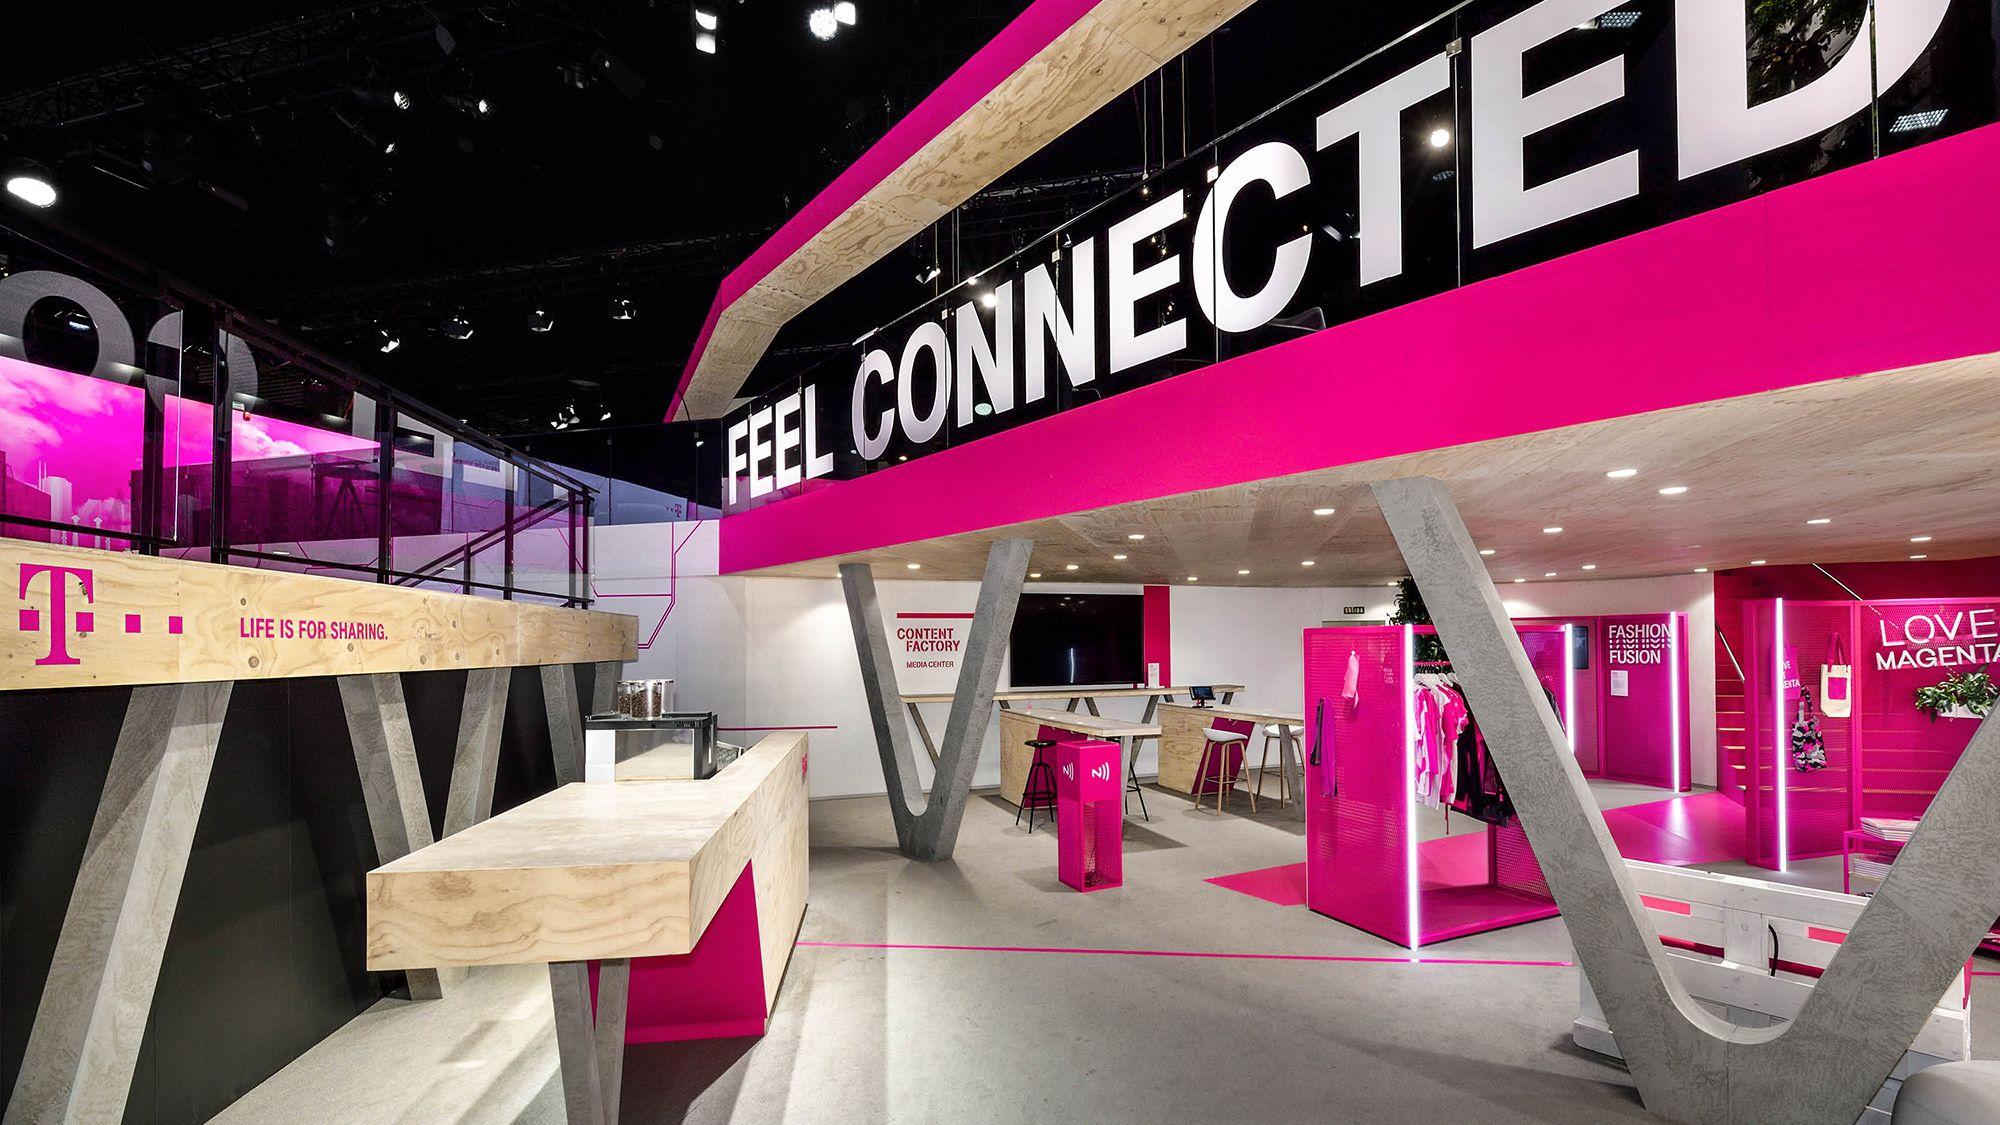 Deutsche Telekom MWC 2017 (With images) Exhibit design